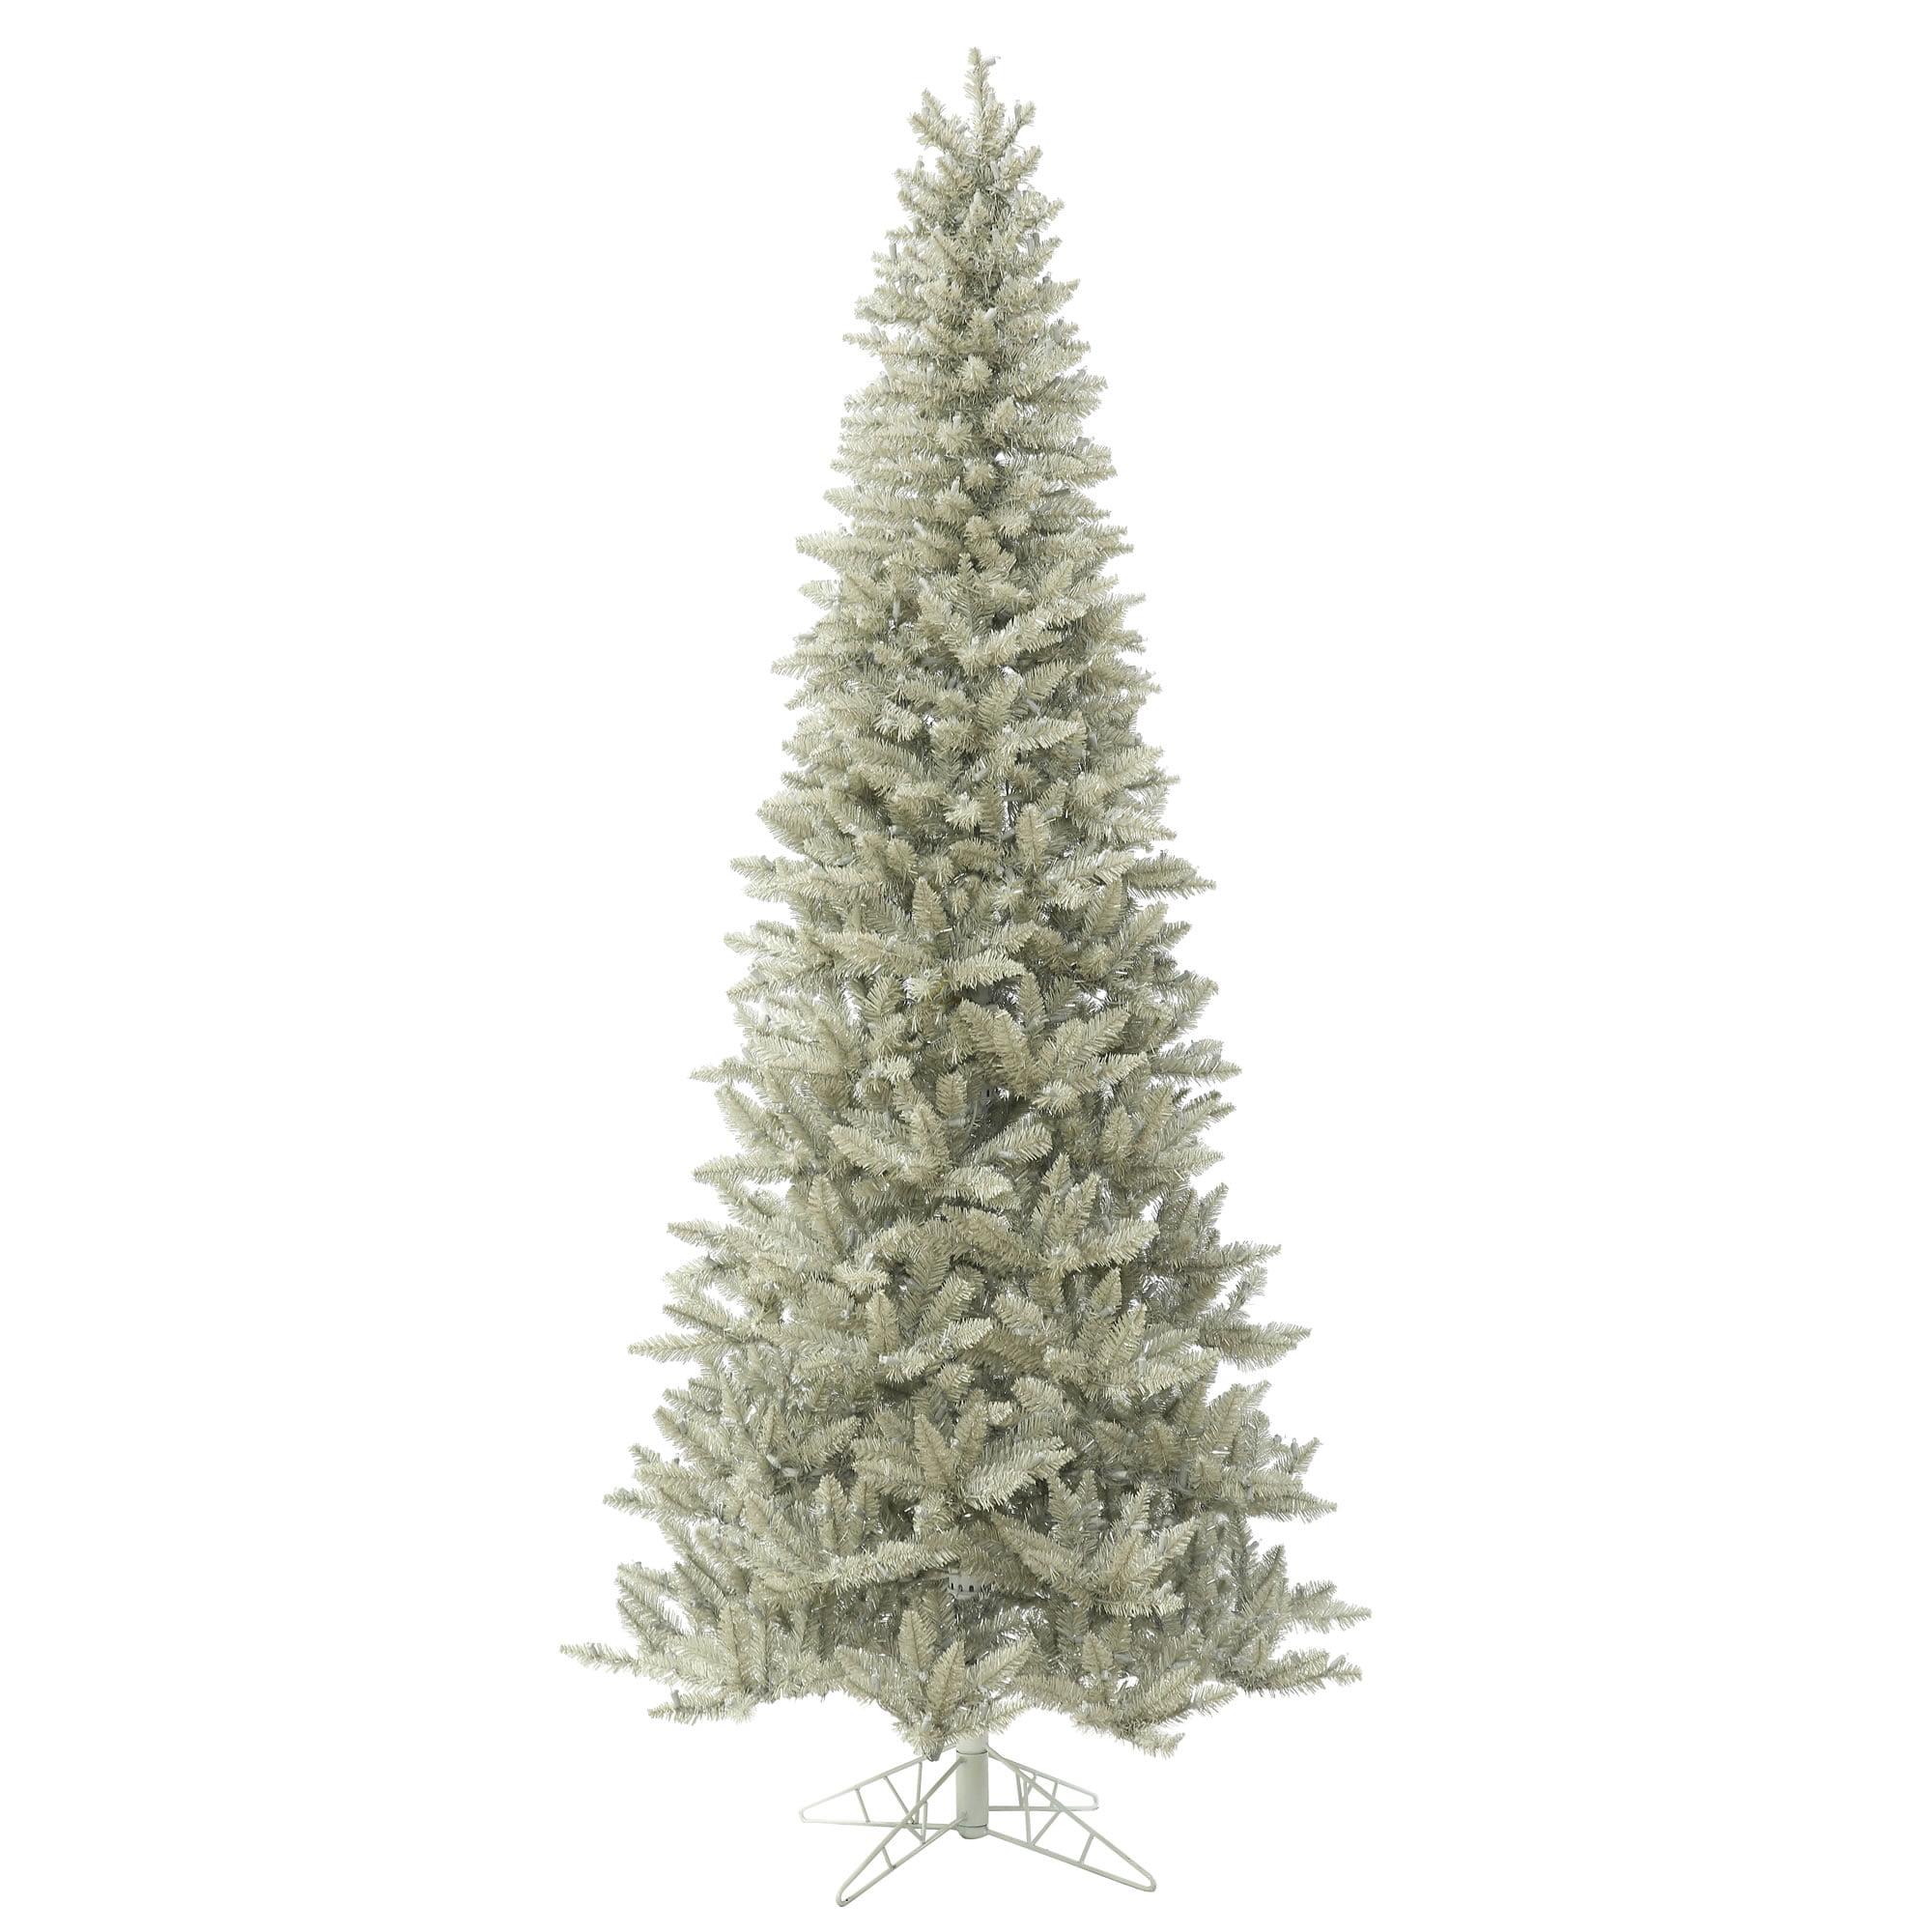 Vickerman Artificial Christmas Tree 7.5